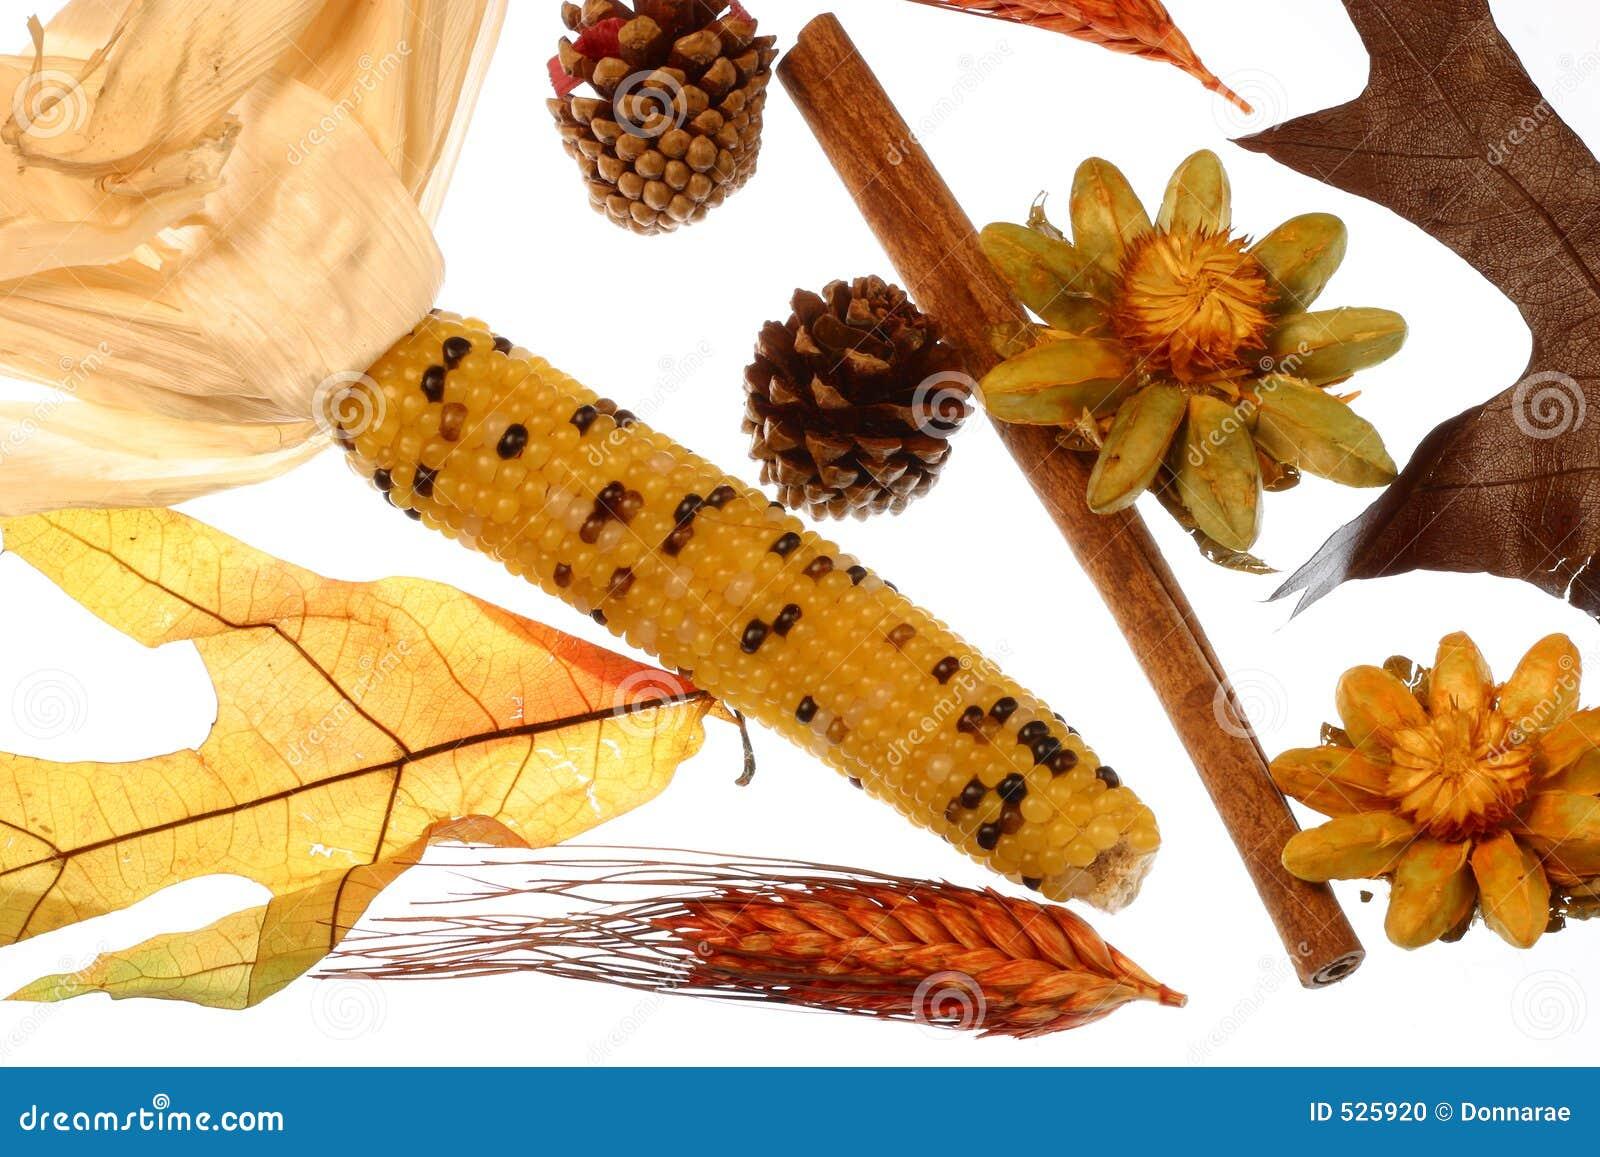 Autum κανέλας κώνων καλαμποκιού ξηρό ραβδί ποτ πουρί πεύκων λουλουδιών ινδικό